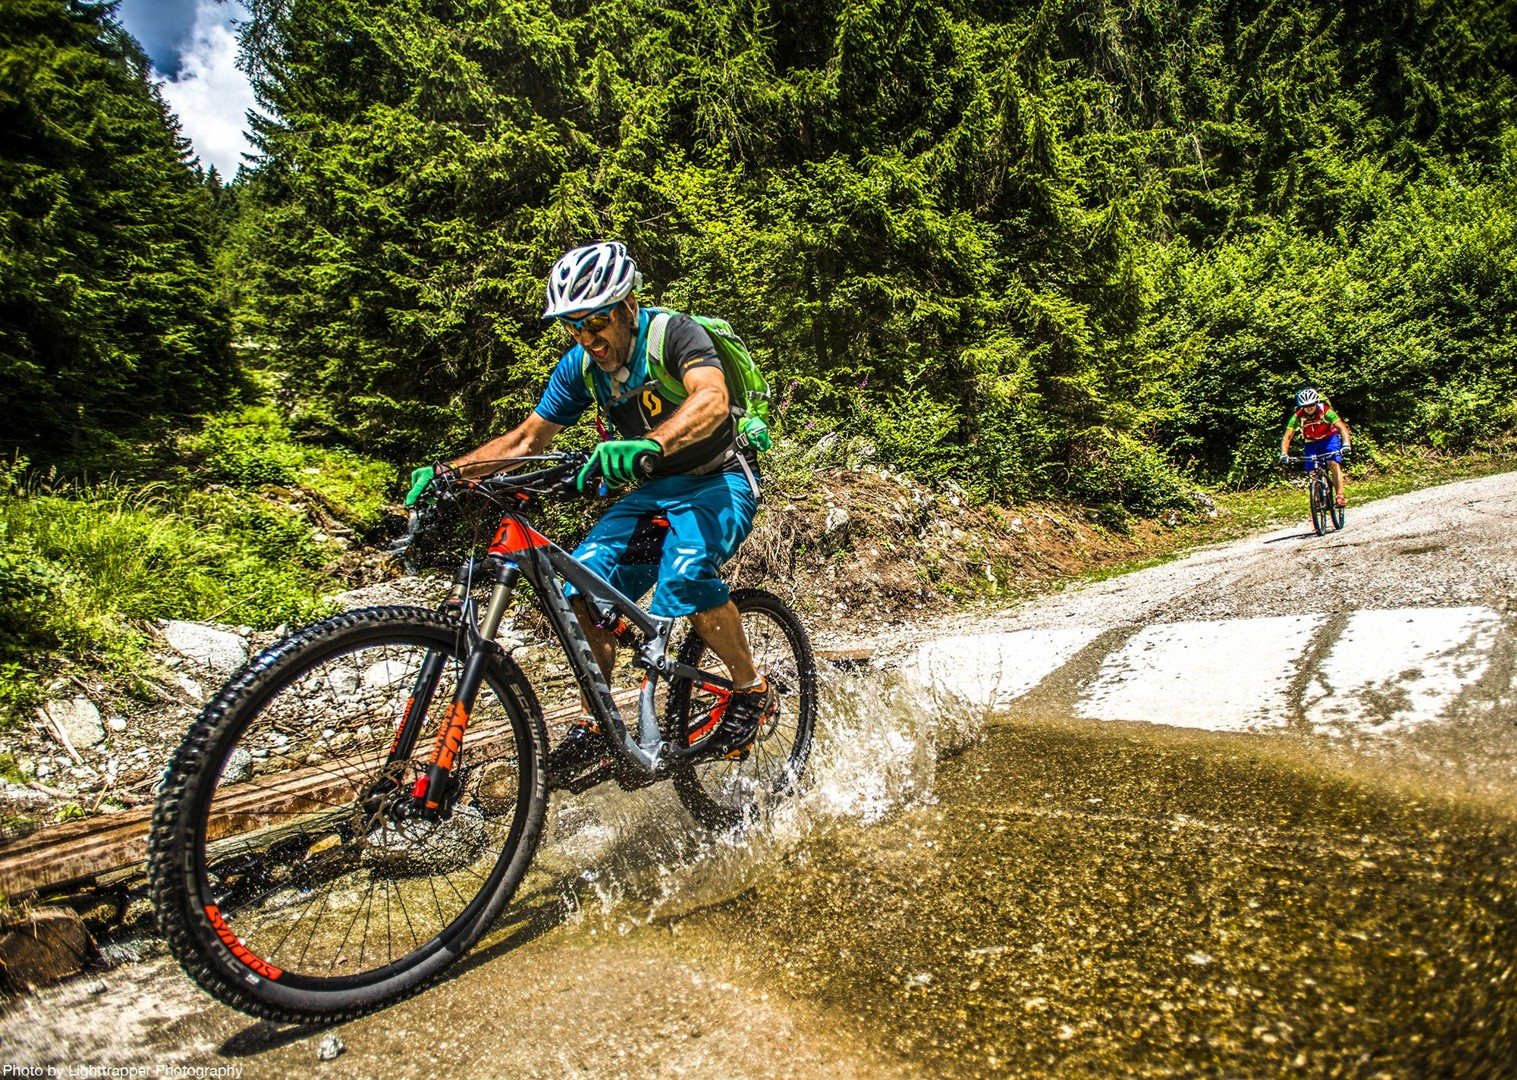 saddle_skedaddle_italy_2017_day6_brenta_dolomites_85-2.jpg - Italy - Dolomites of Brenta - Guided Mountain Bike Holiday - Mountain Biking